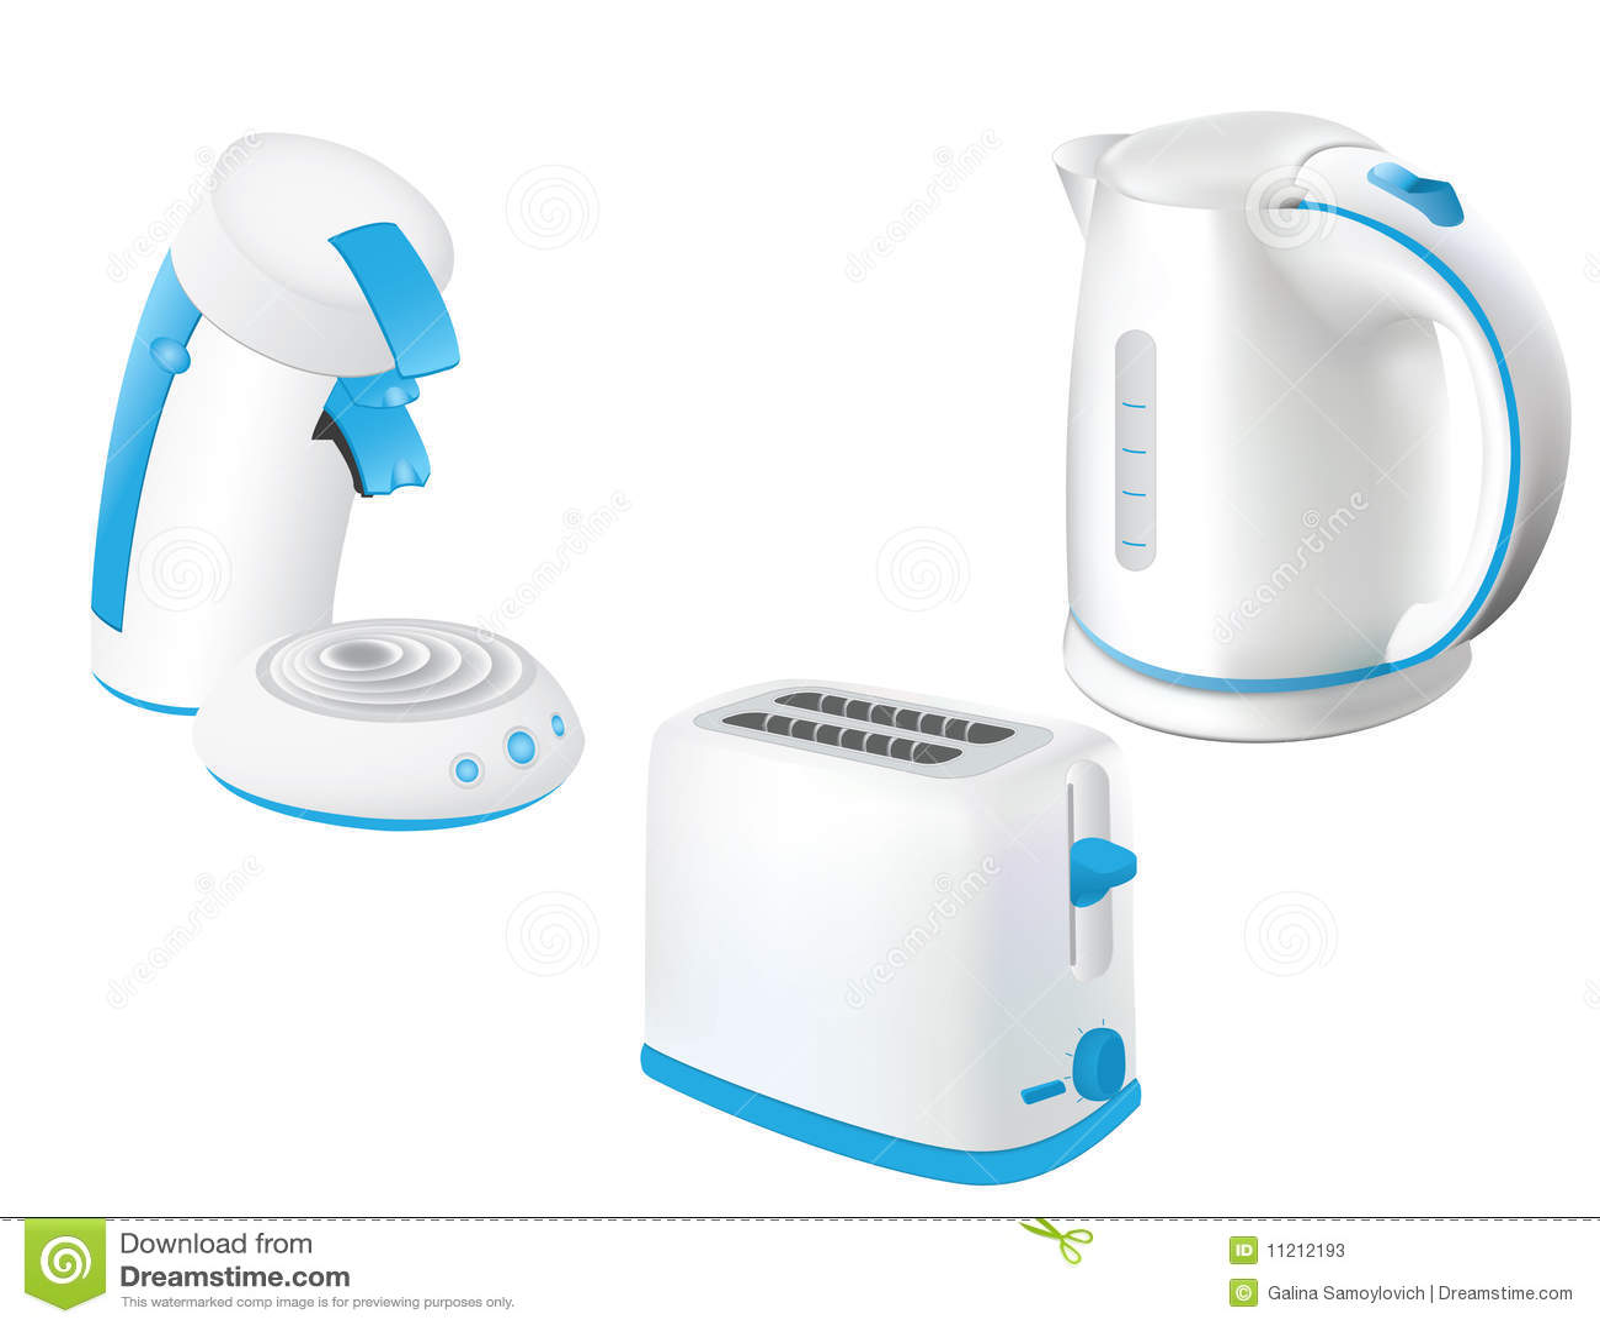 Kitchen Electrical Appliances : Kitchen Electrical Appliances Stock Photos - Image: 11212193